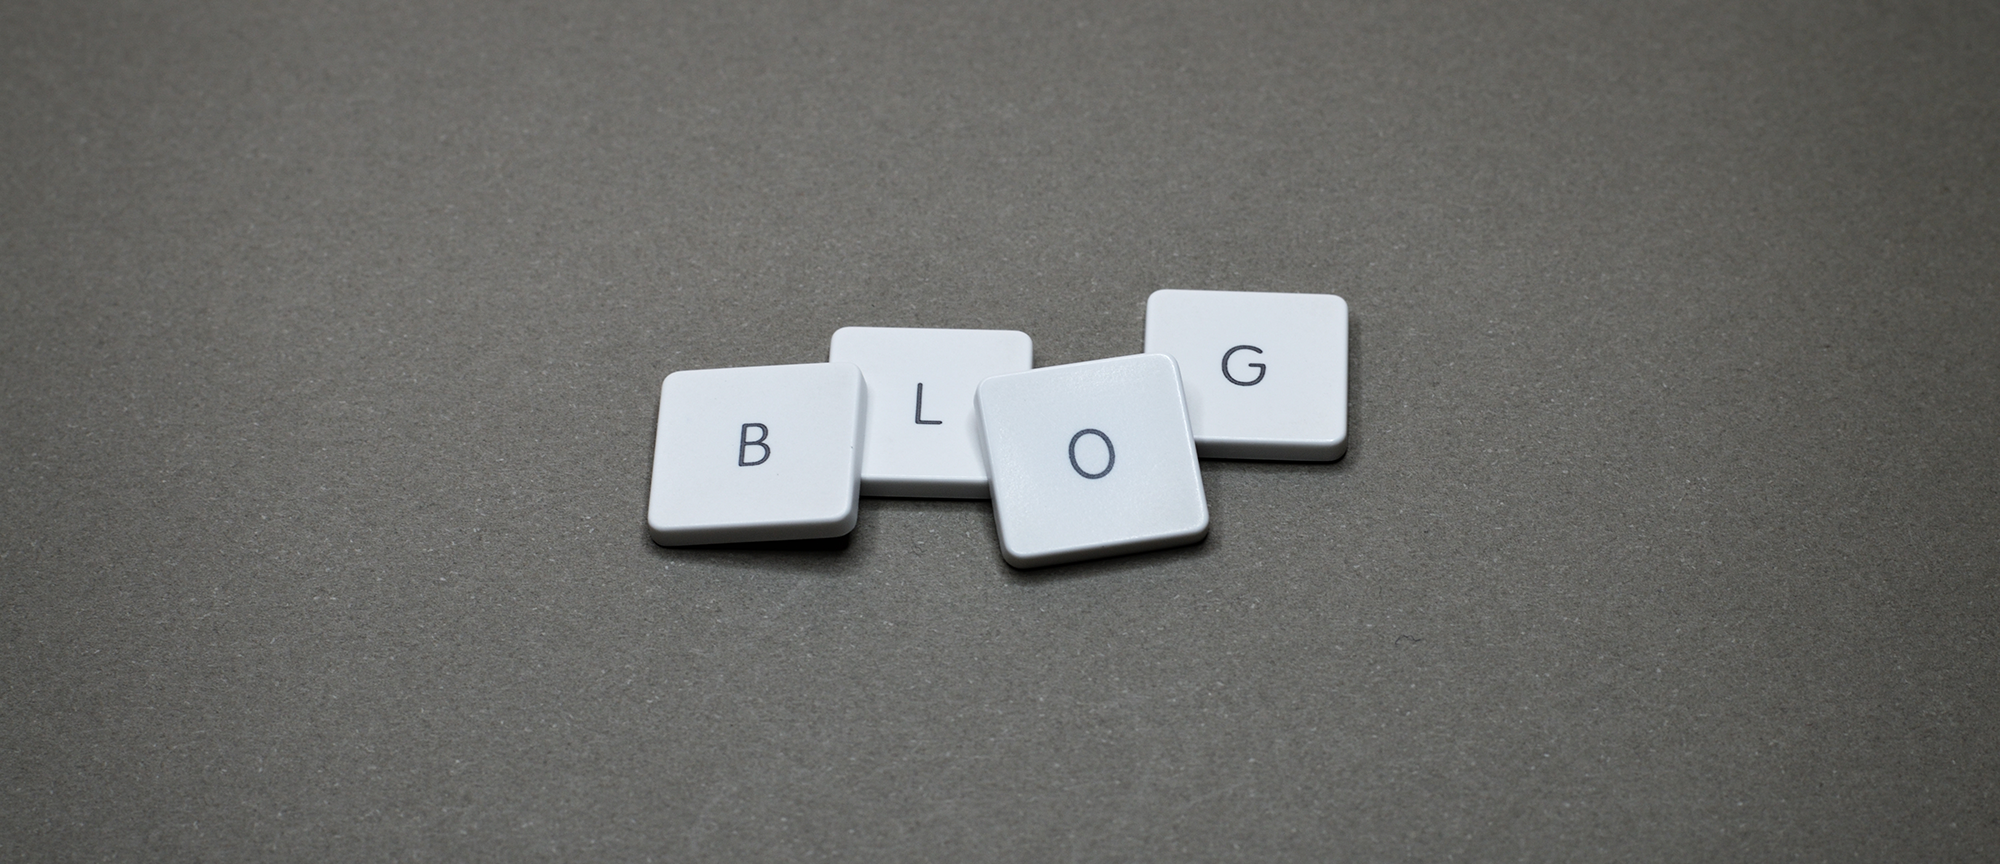 Blog CoLa